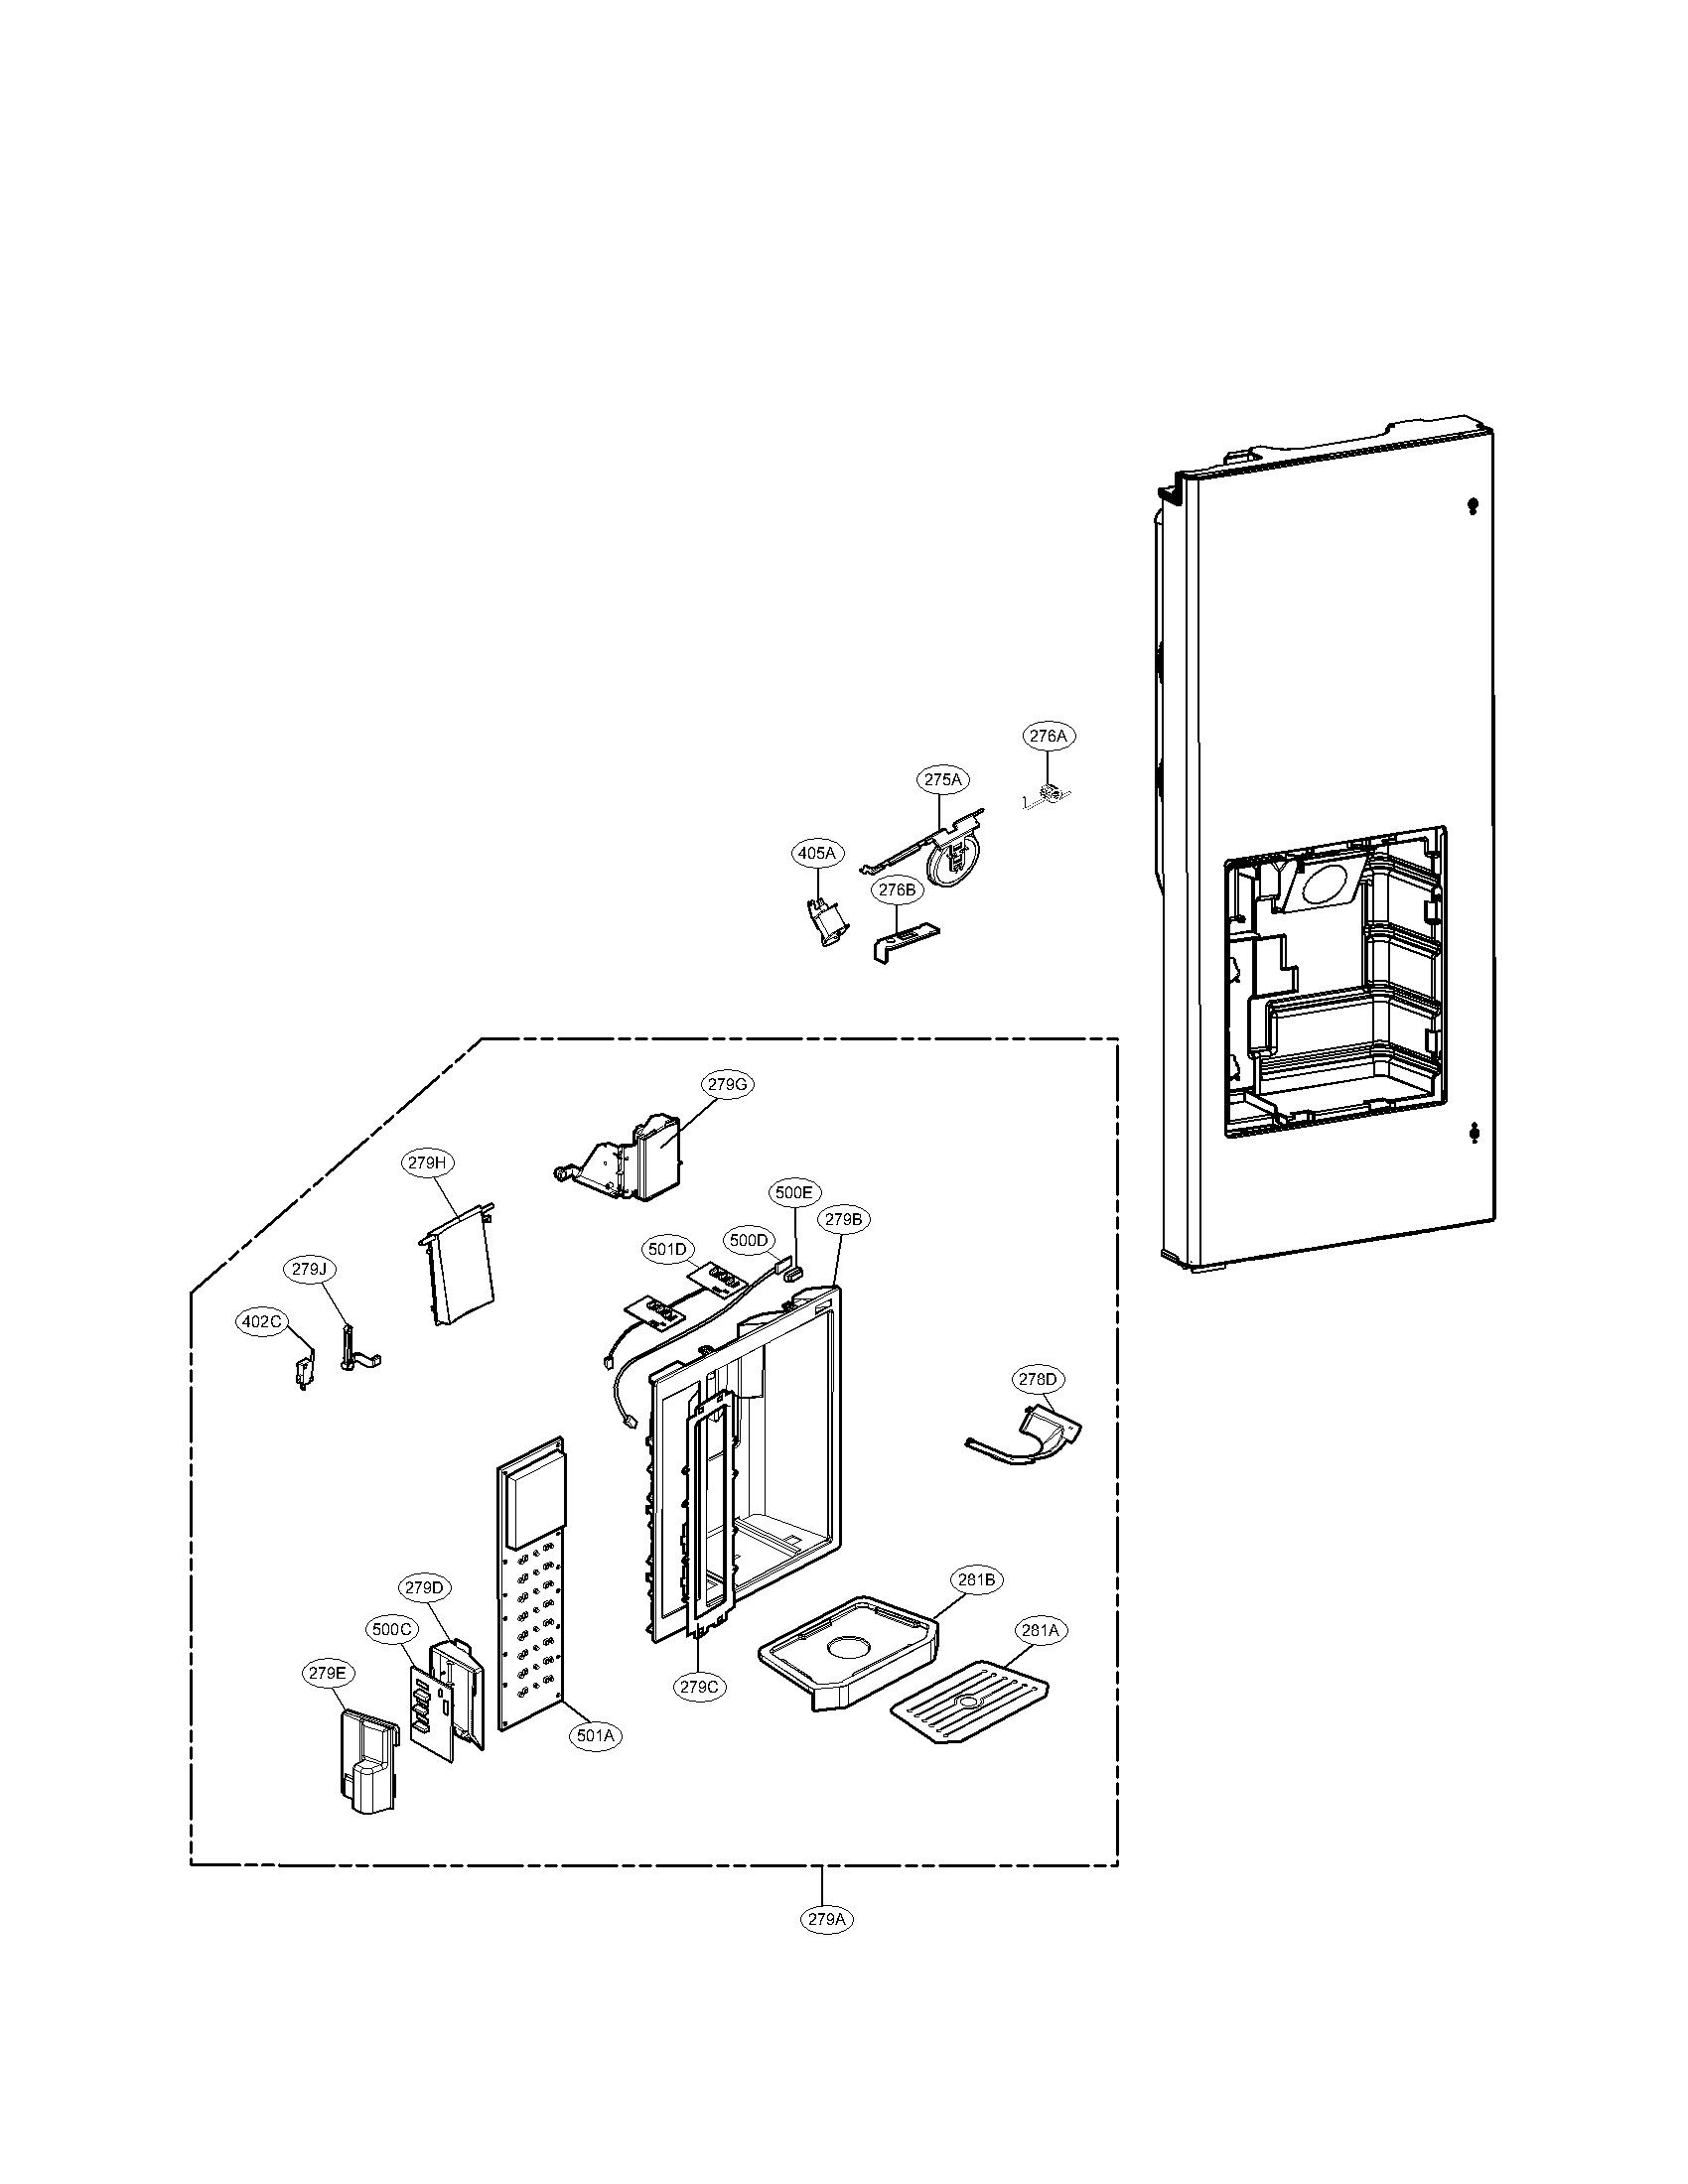 Lg model LMX25984ST/00 bottom-mount refrigerator genuine parts